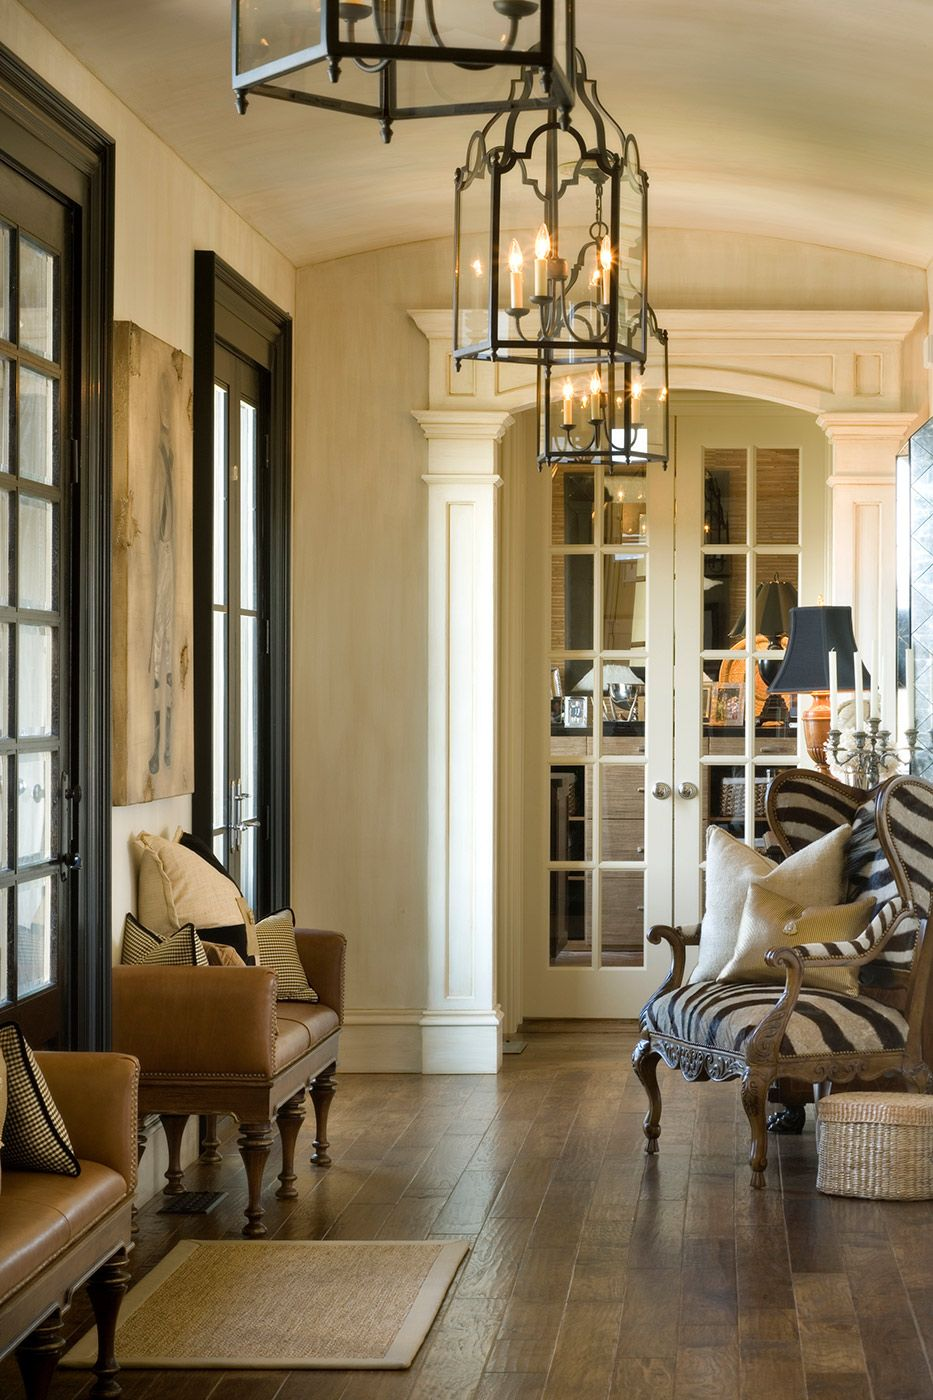 Home interior design windows pin by carol bodurtha on design  pinterest  home decor home and house